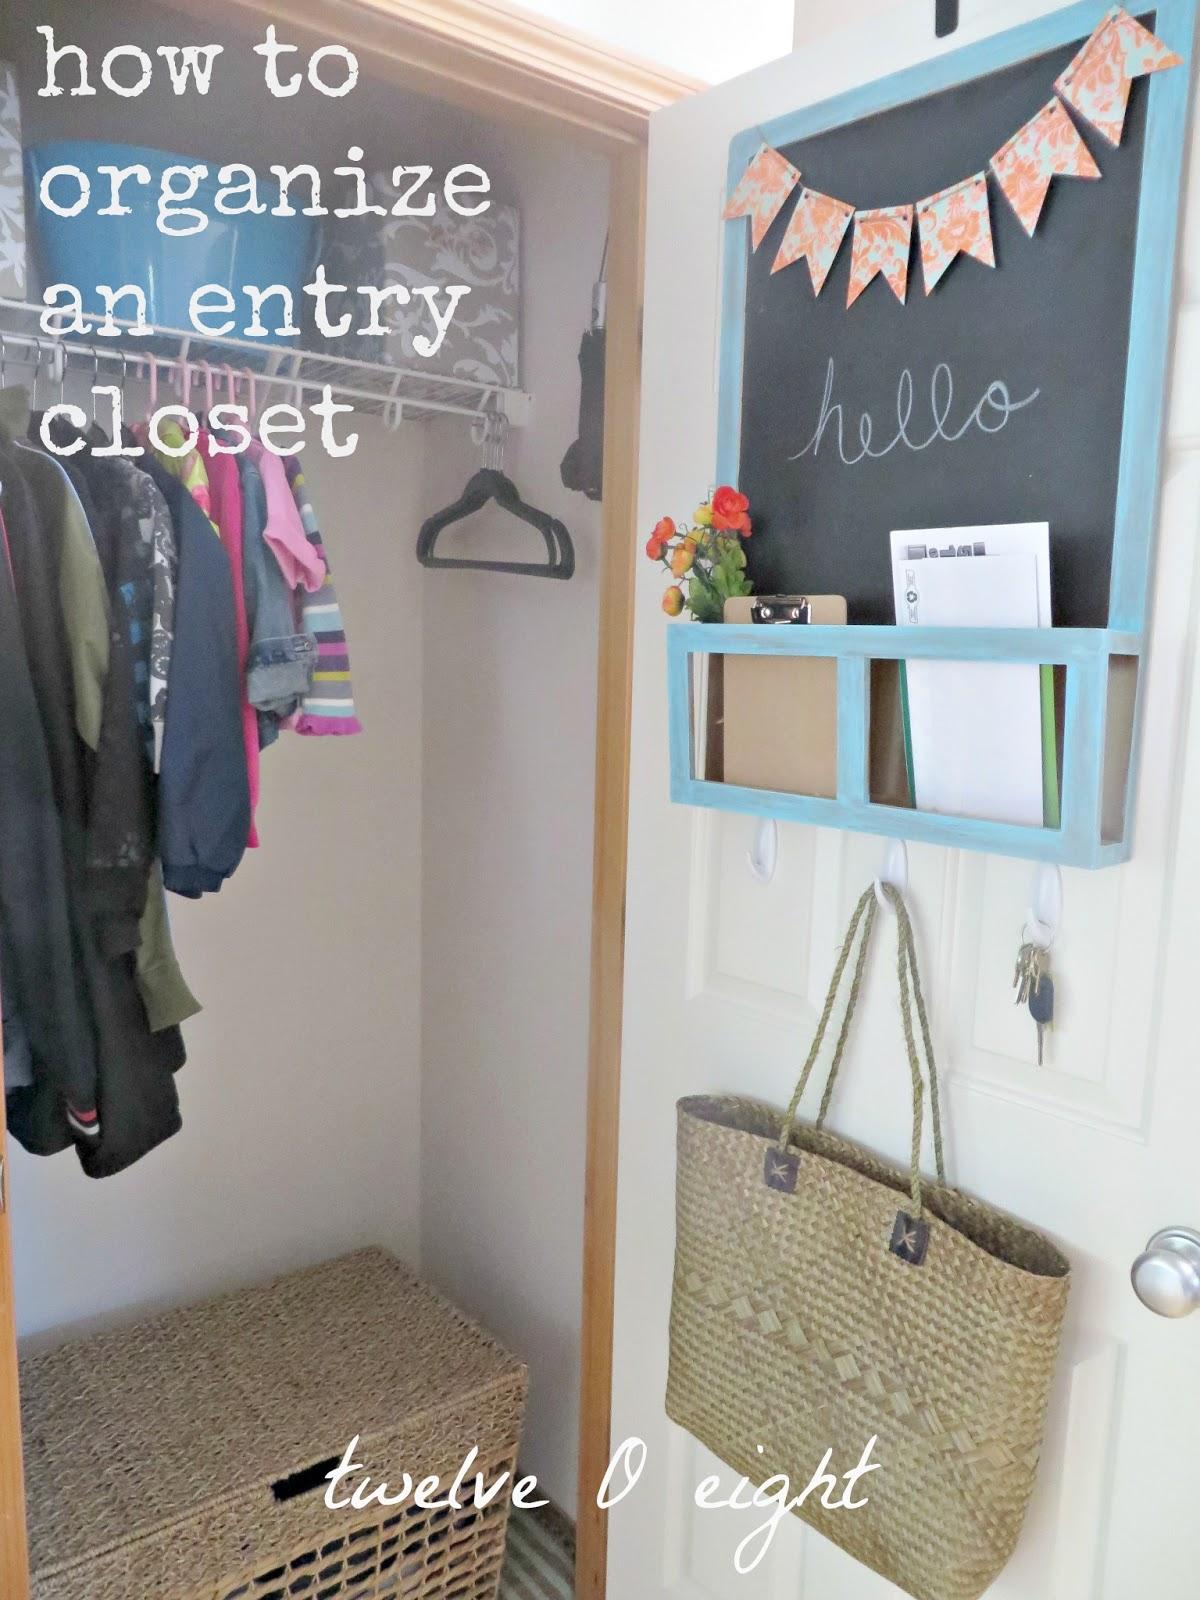 Foyer Closet Organization Ideas : How to organize an entryway closet roselawnlutheran